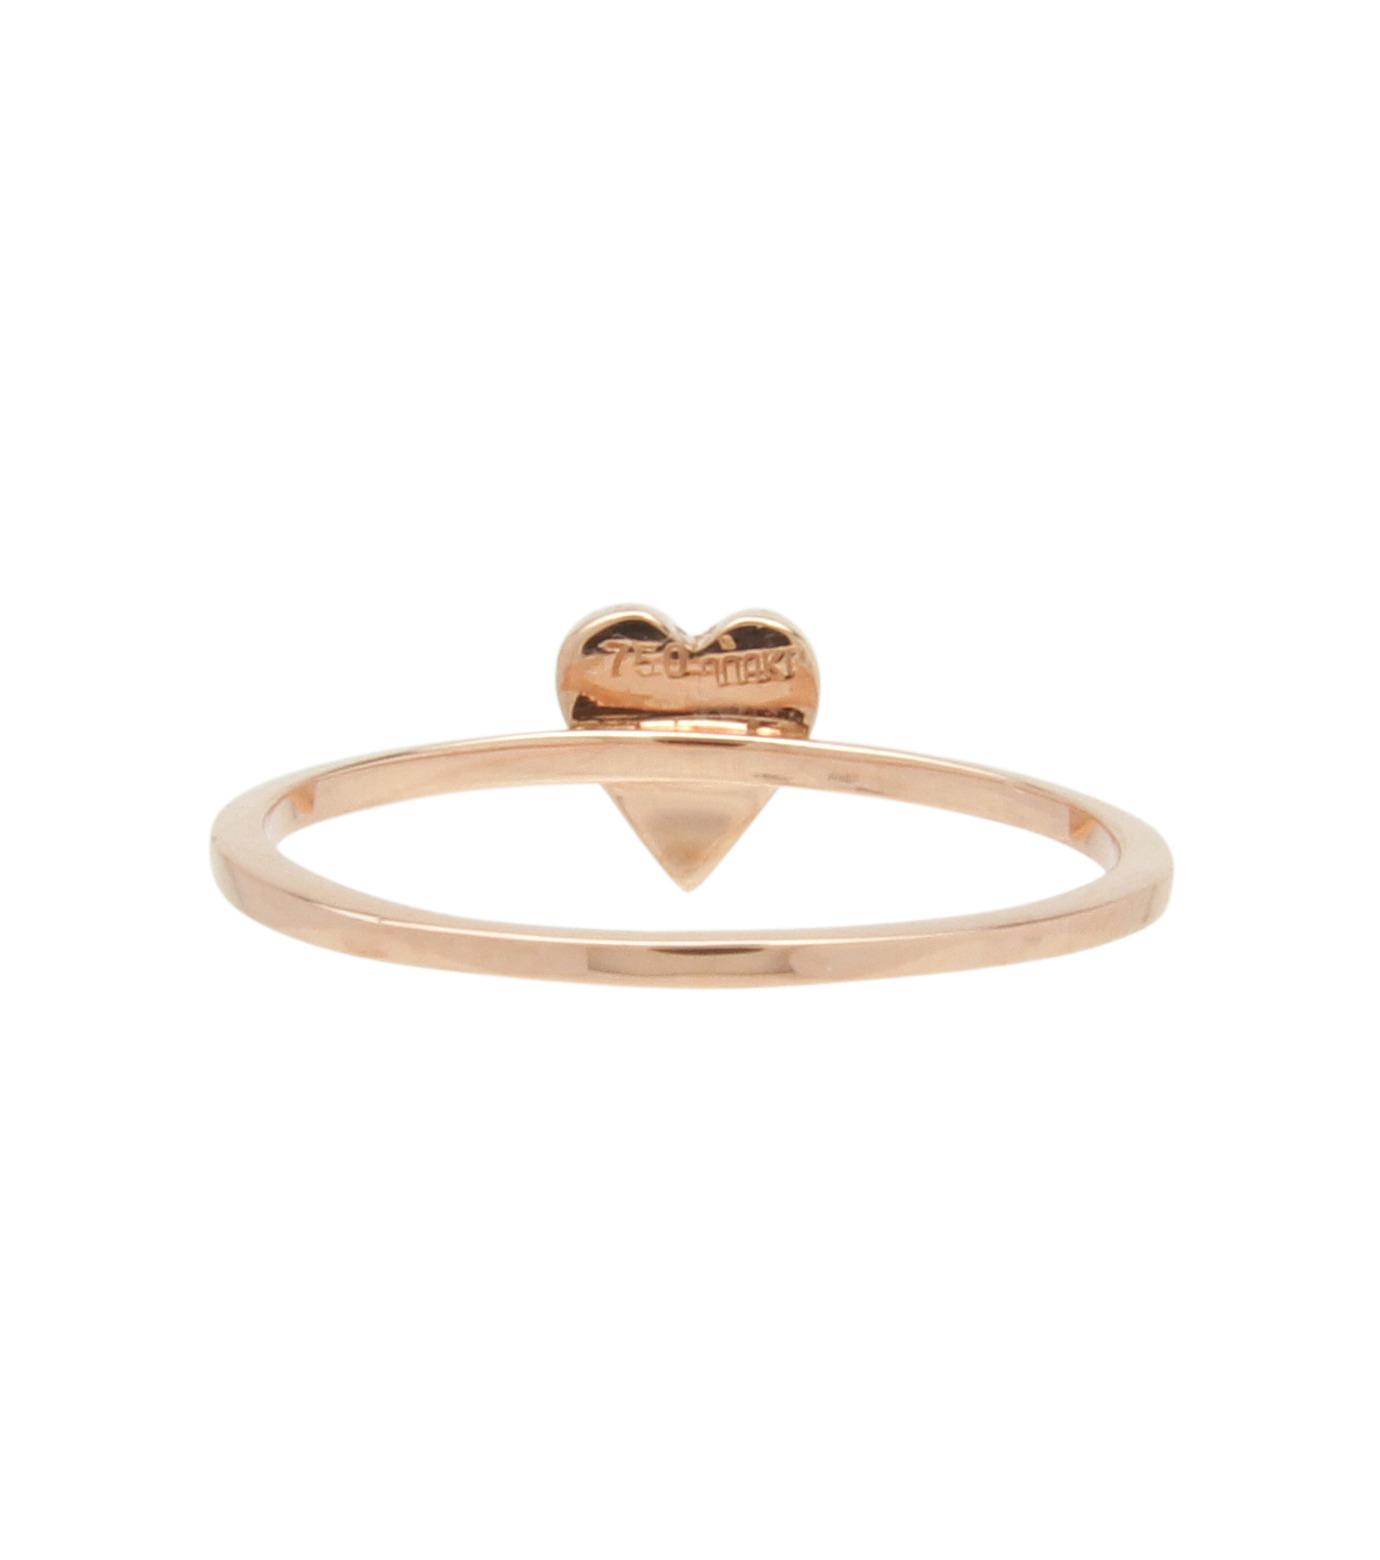 Ileana Makri(イリーナ マクリ)のLove Ring Pink Gold-Ruby-ROSE(リング/ring)-O272-39-006-75 拡大詳細画像3